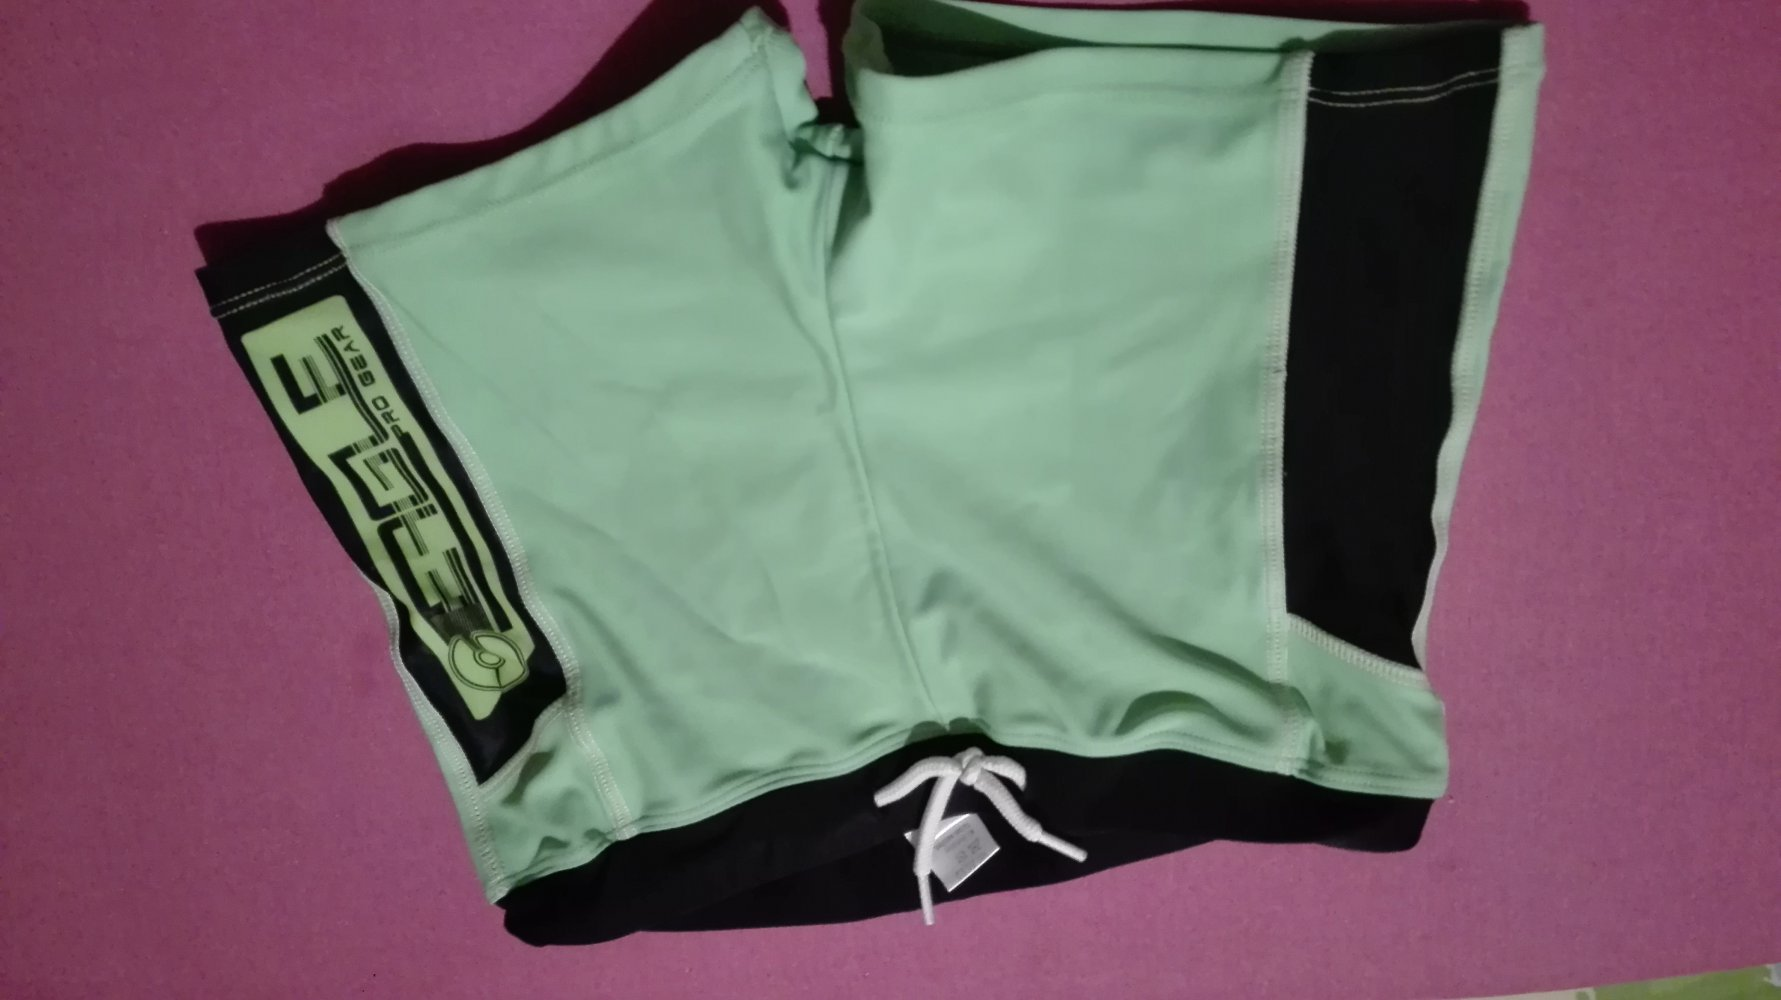 yigga - Yigga - grüne Badehose mit schwarzen Absetzungen ...